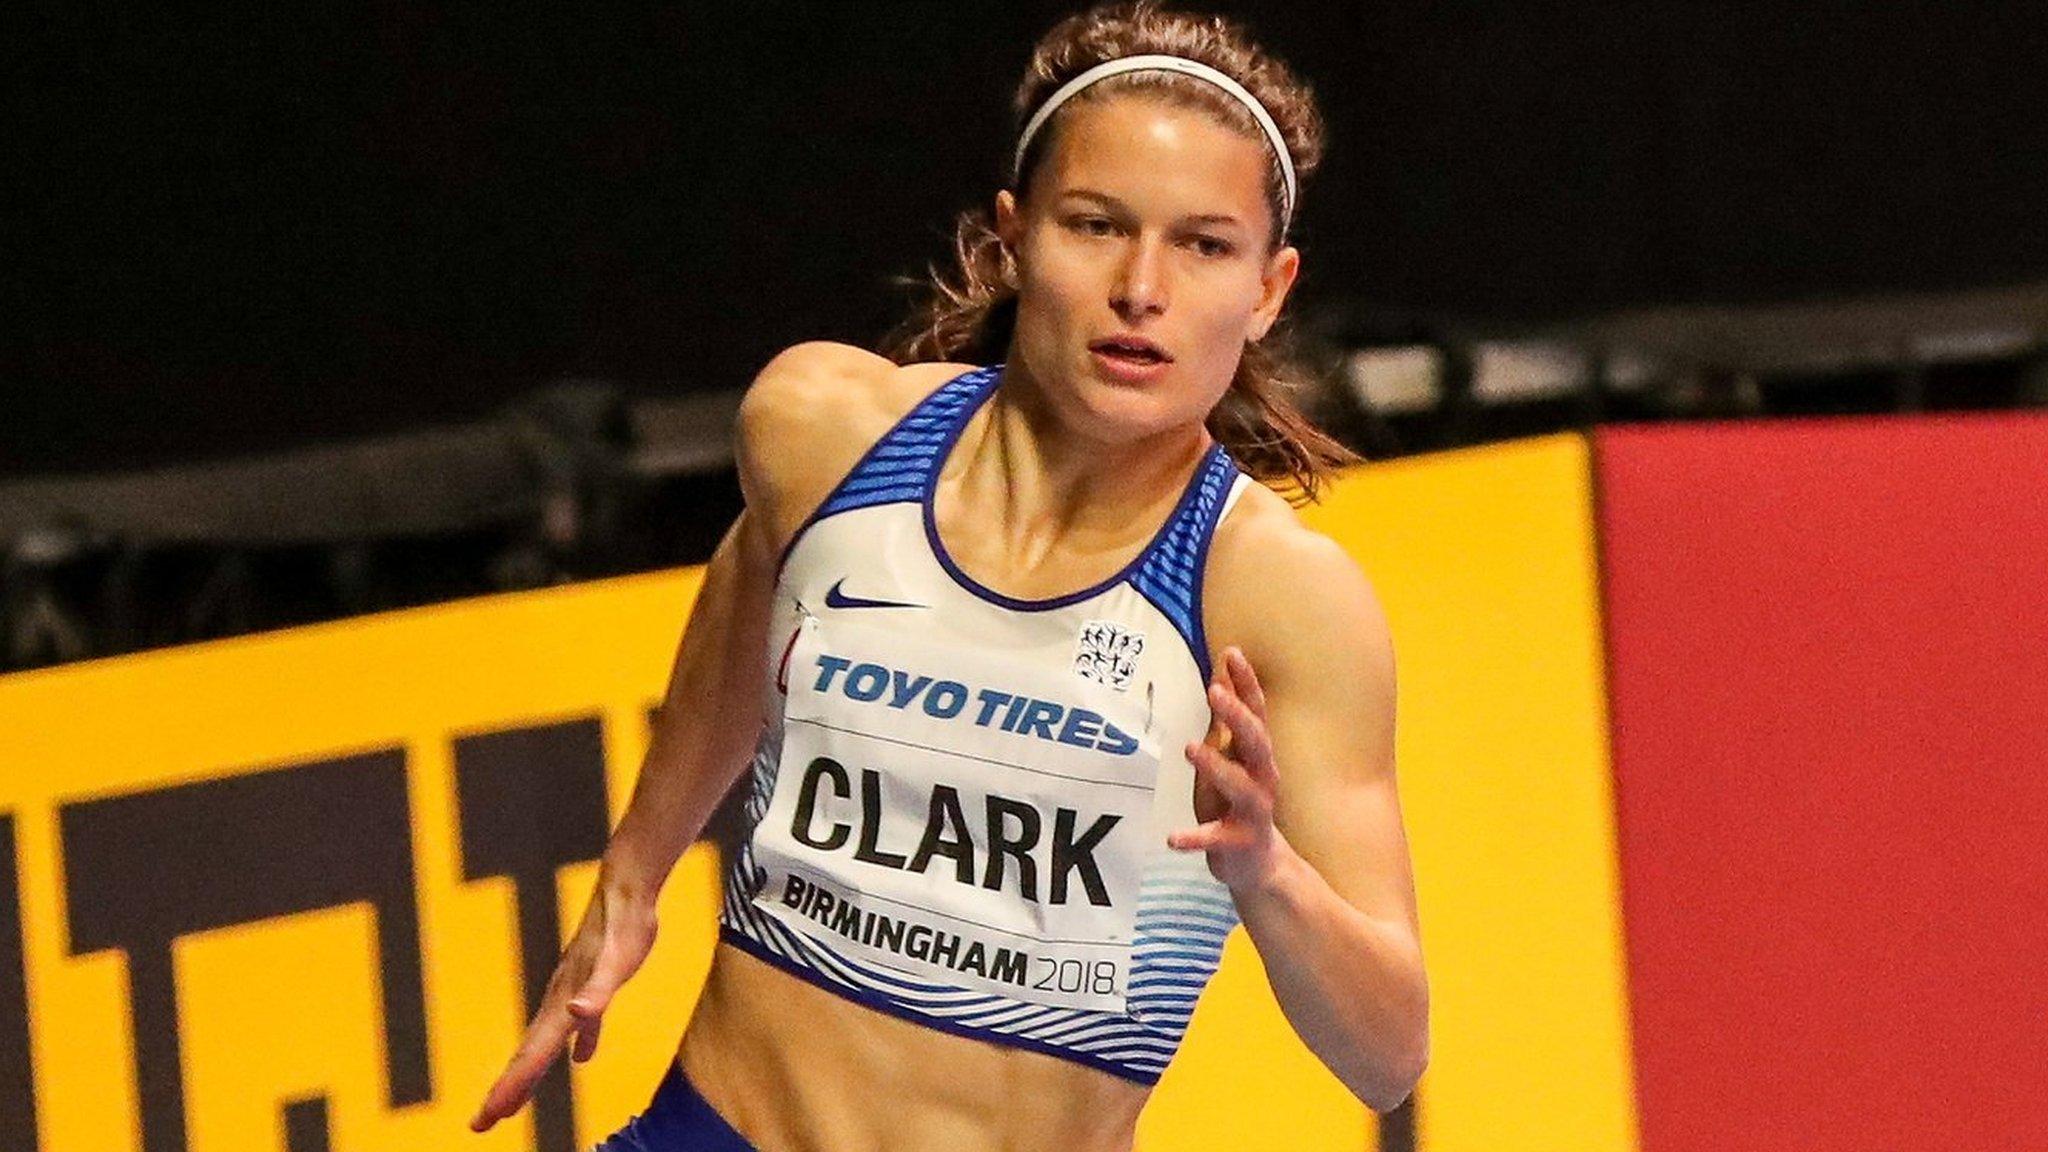 Scots' 'golden generation' so impressive - Clark